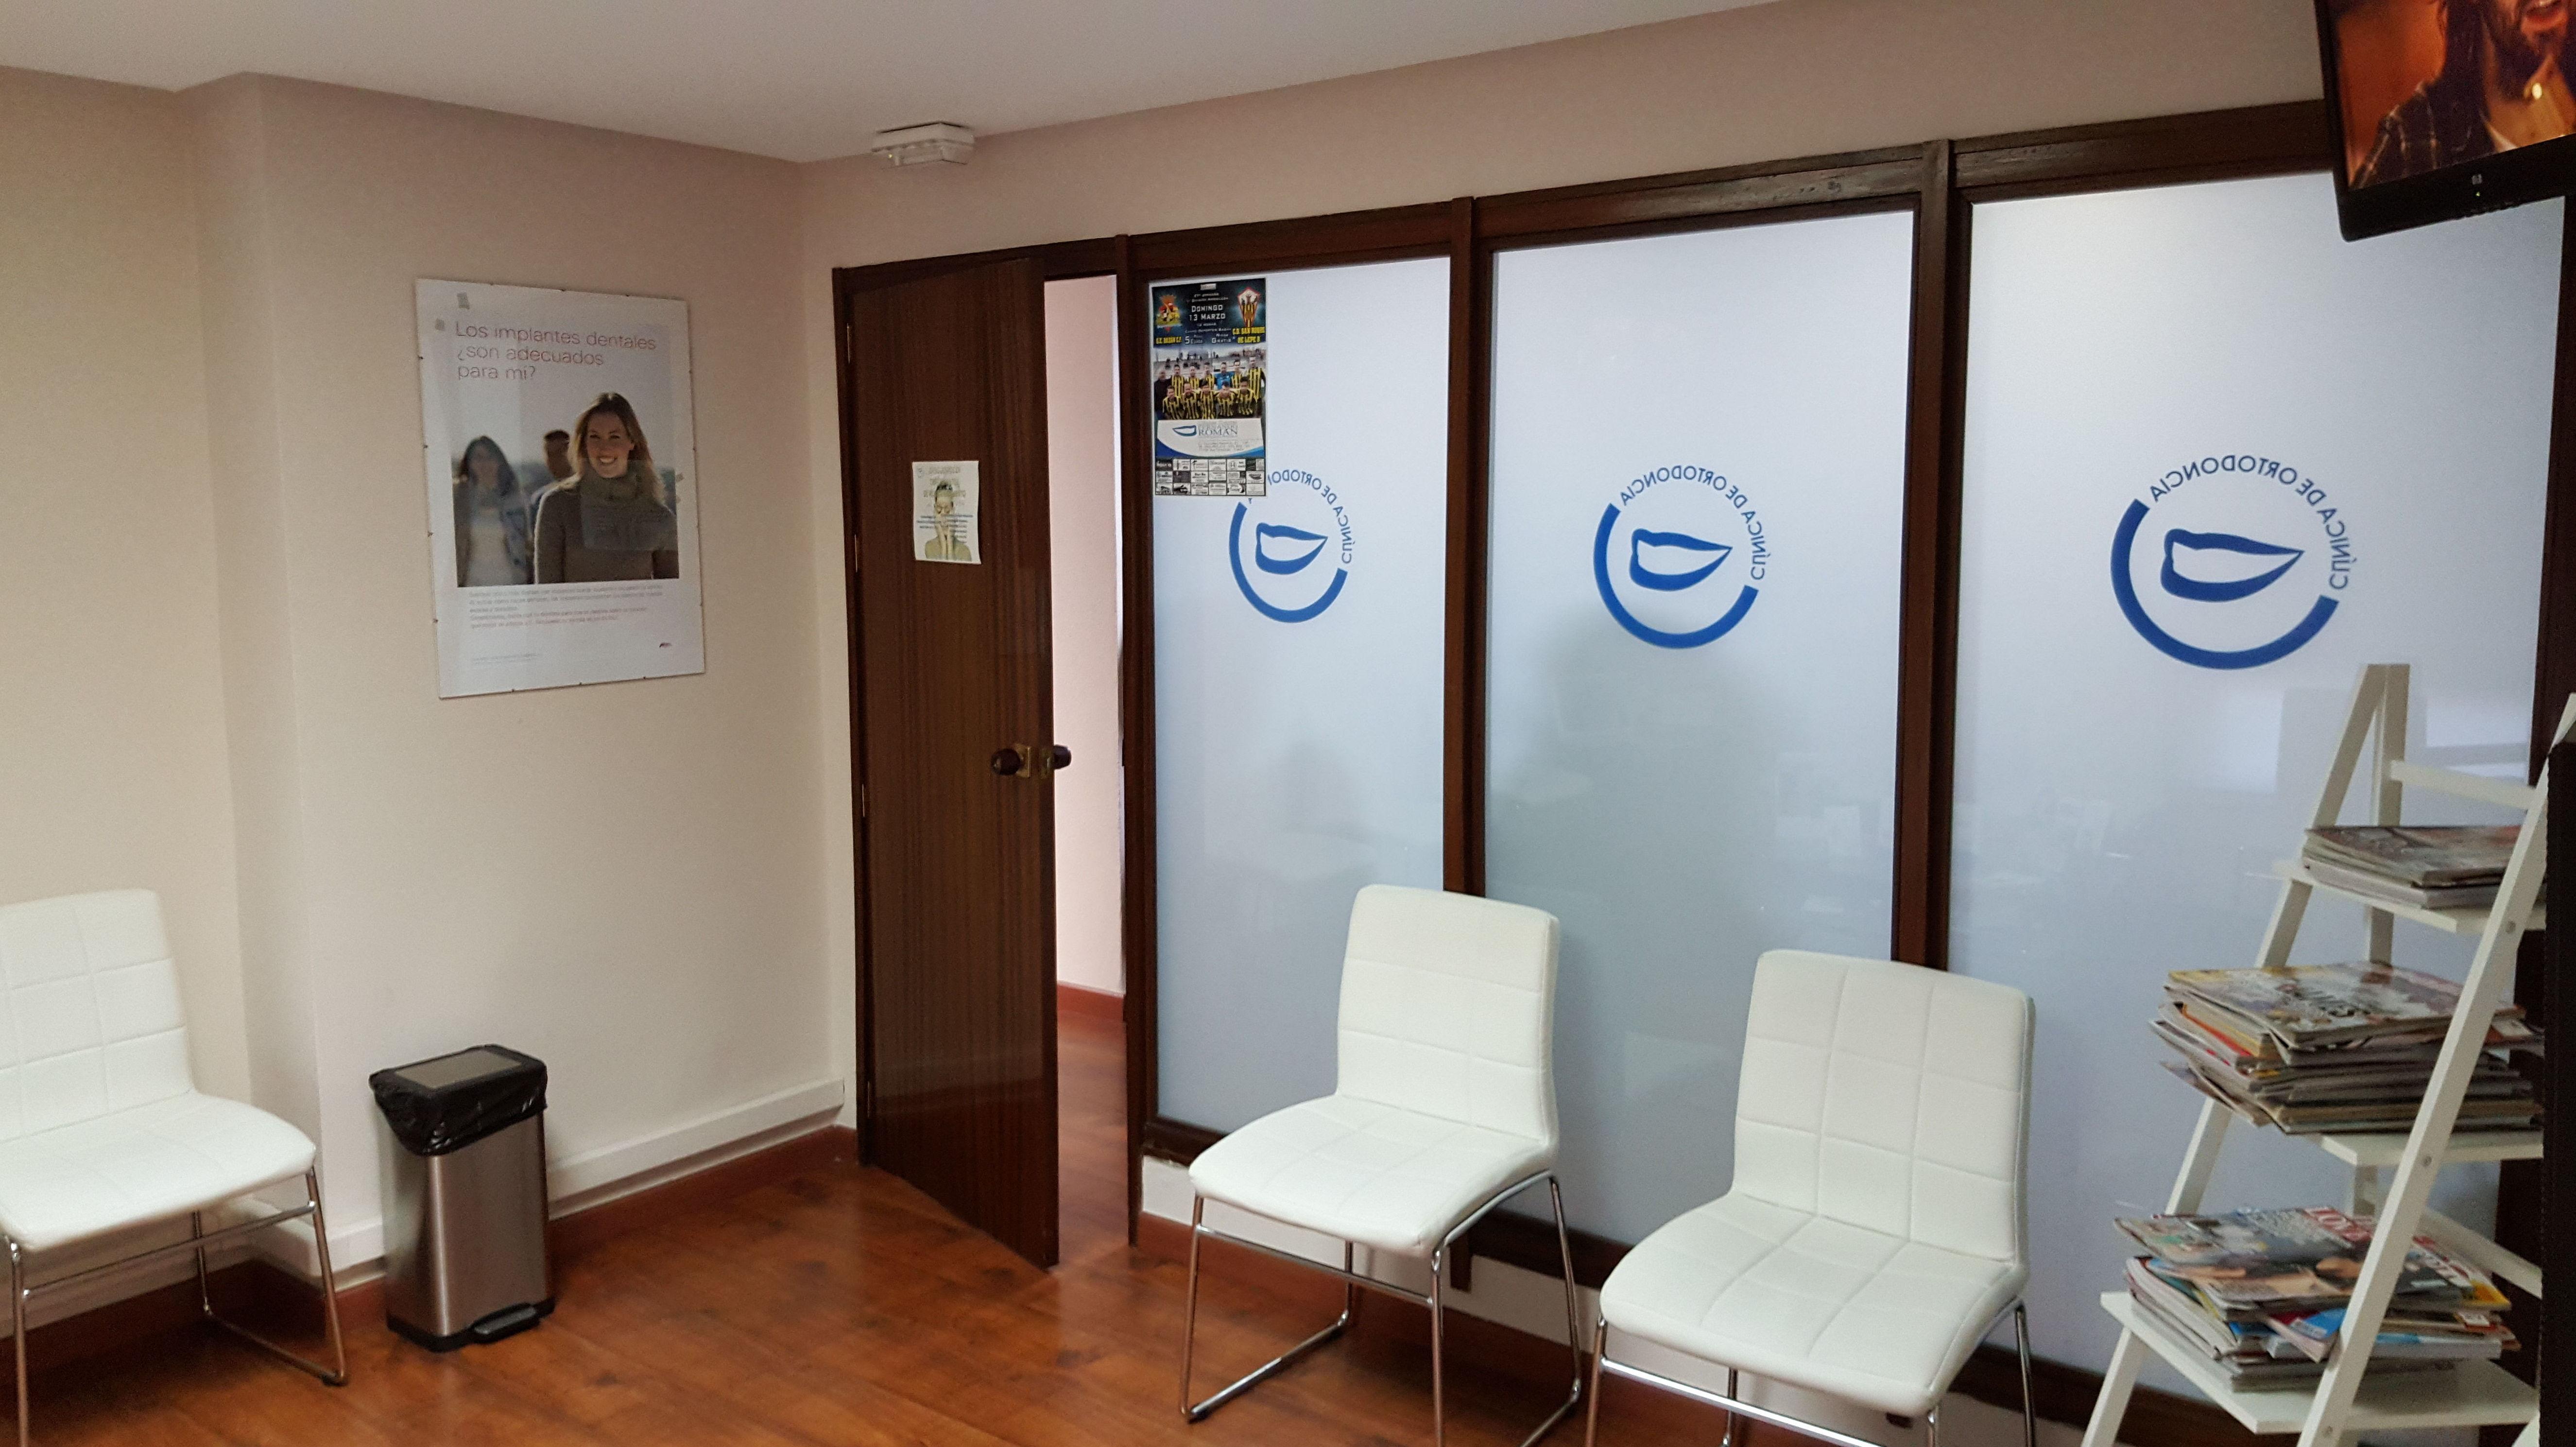 Foto 16 de Dentistas en San Fernando | Odontología Integral Fernando Román